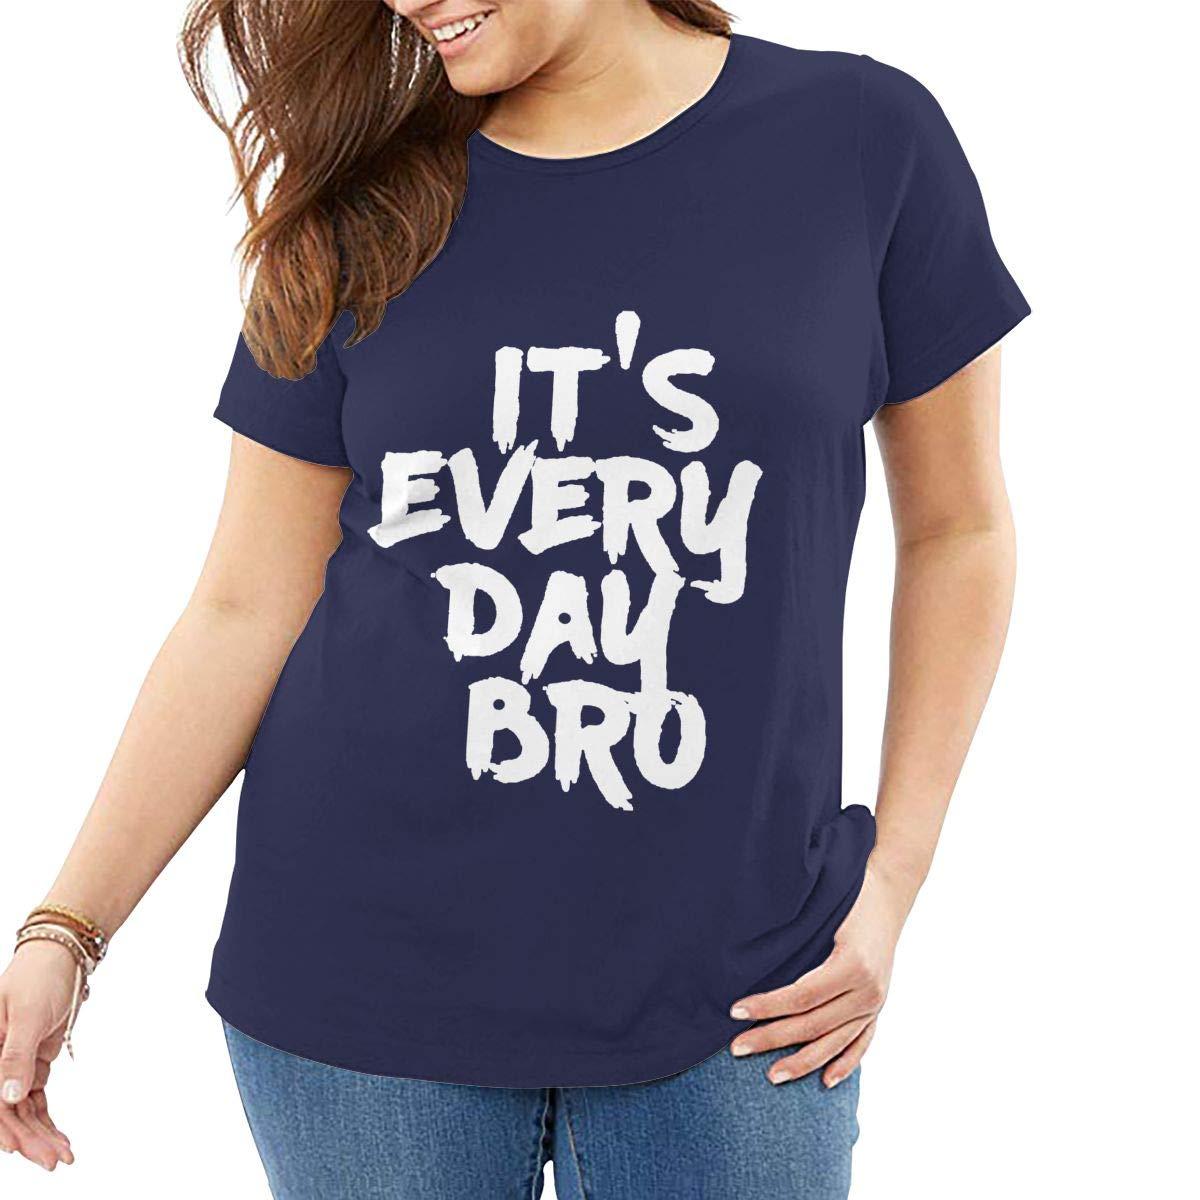 Fat Women's T Shirt Jake Paul It's Every Day BRO Tee Shirts T-Shirt Short-Sleeve Round Neck Tshirt for Women Girls Navy 5XL by BKashy